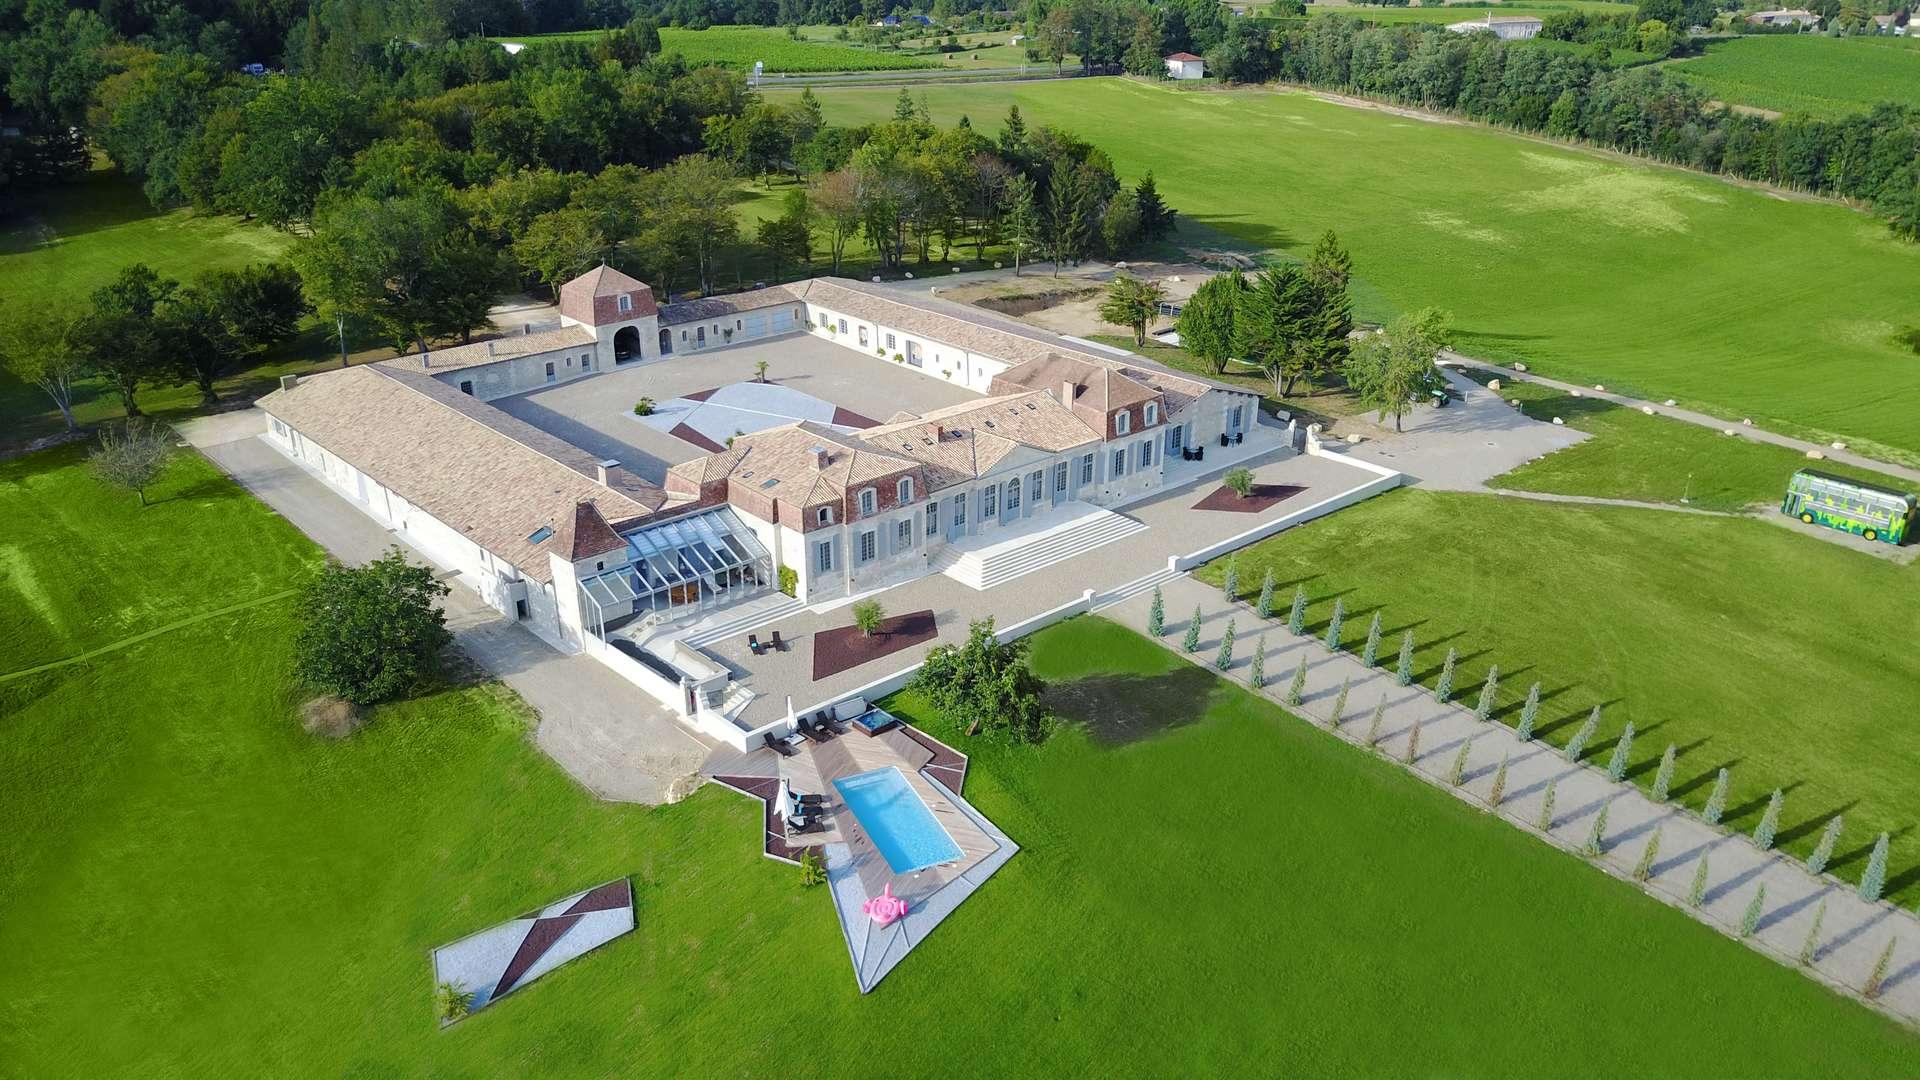 Luxury vacation rentals europe - France - Southwest france - Bord eaux - Chateau Prestige - Image 1/35